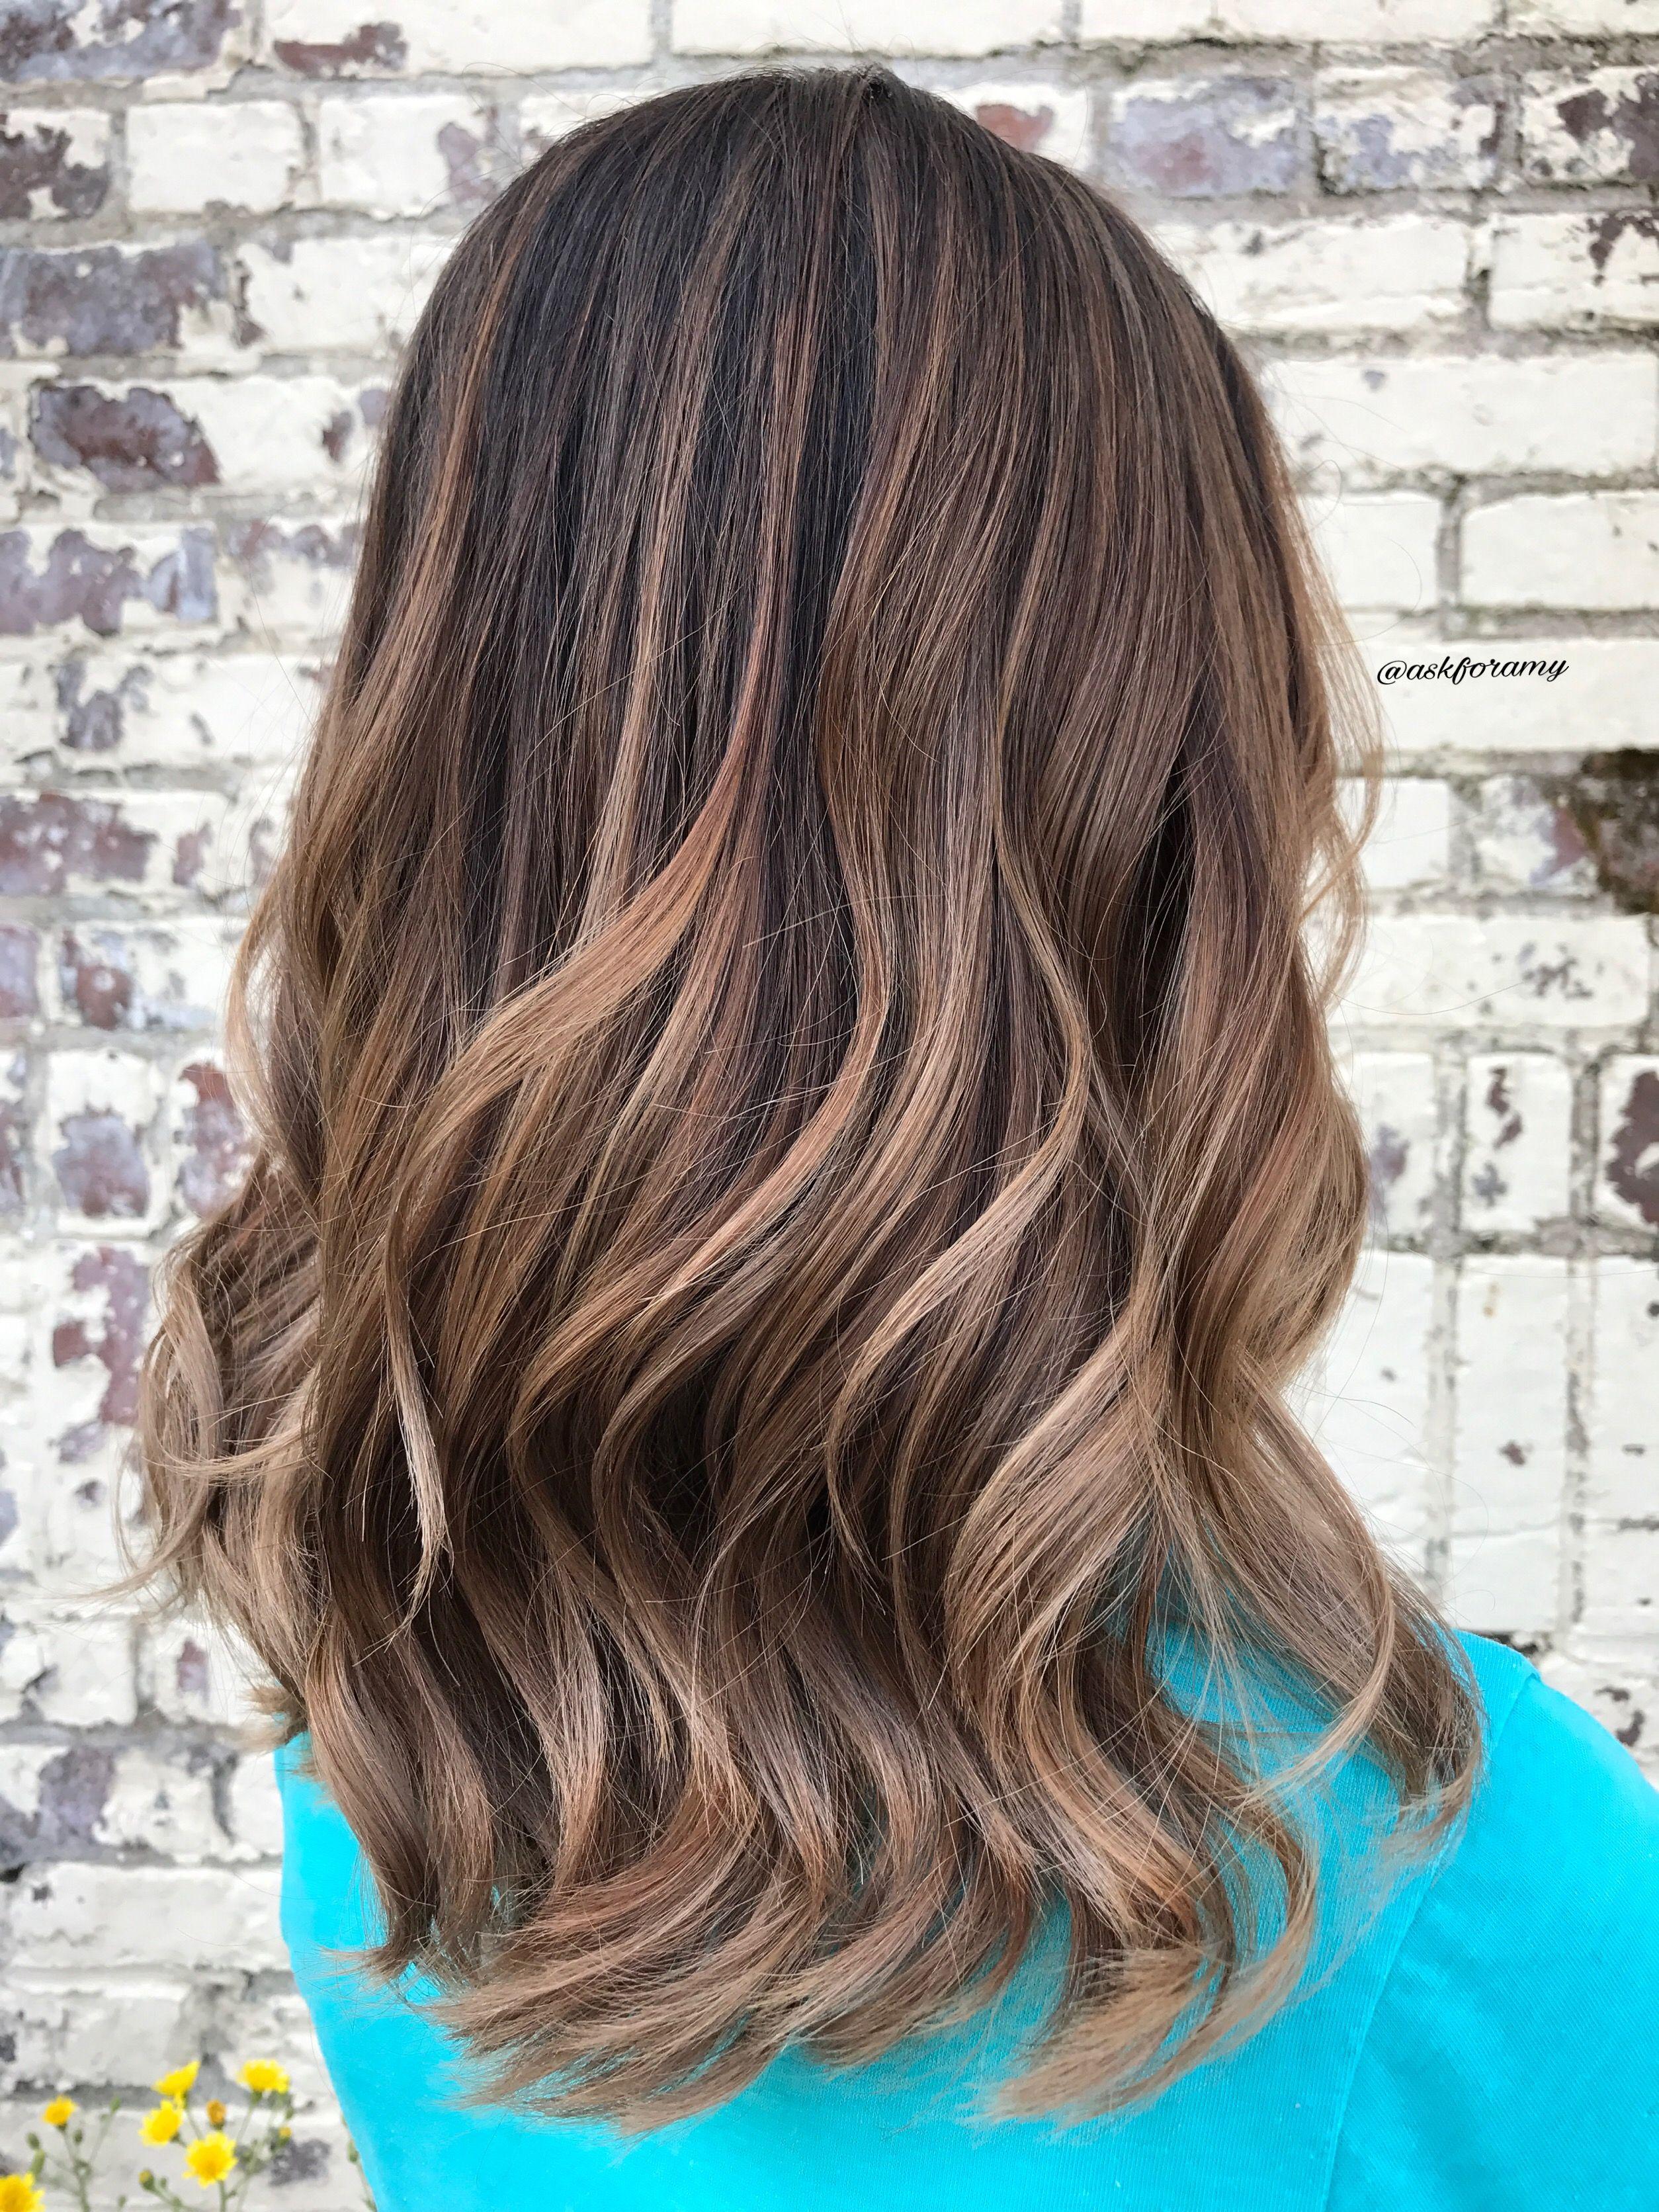 Cool Toned Balayage Caramel Brunette Brown Hair By Askforamy Balayage Hair Balayage Hair Caramel